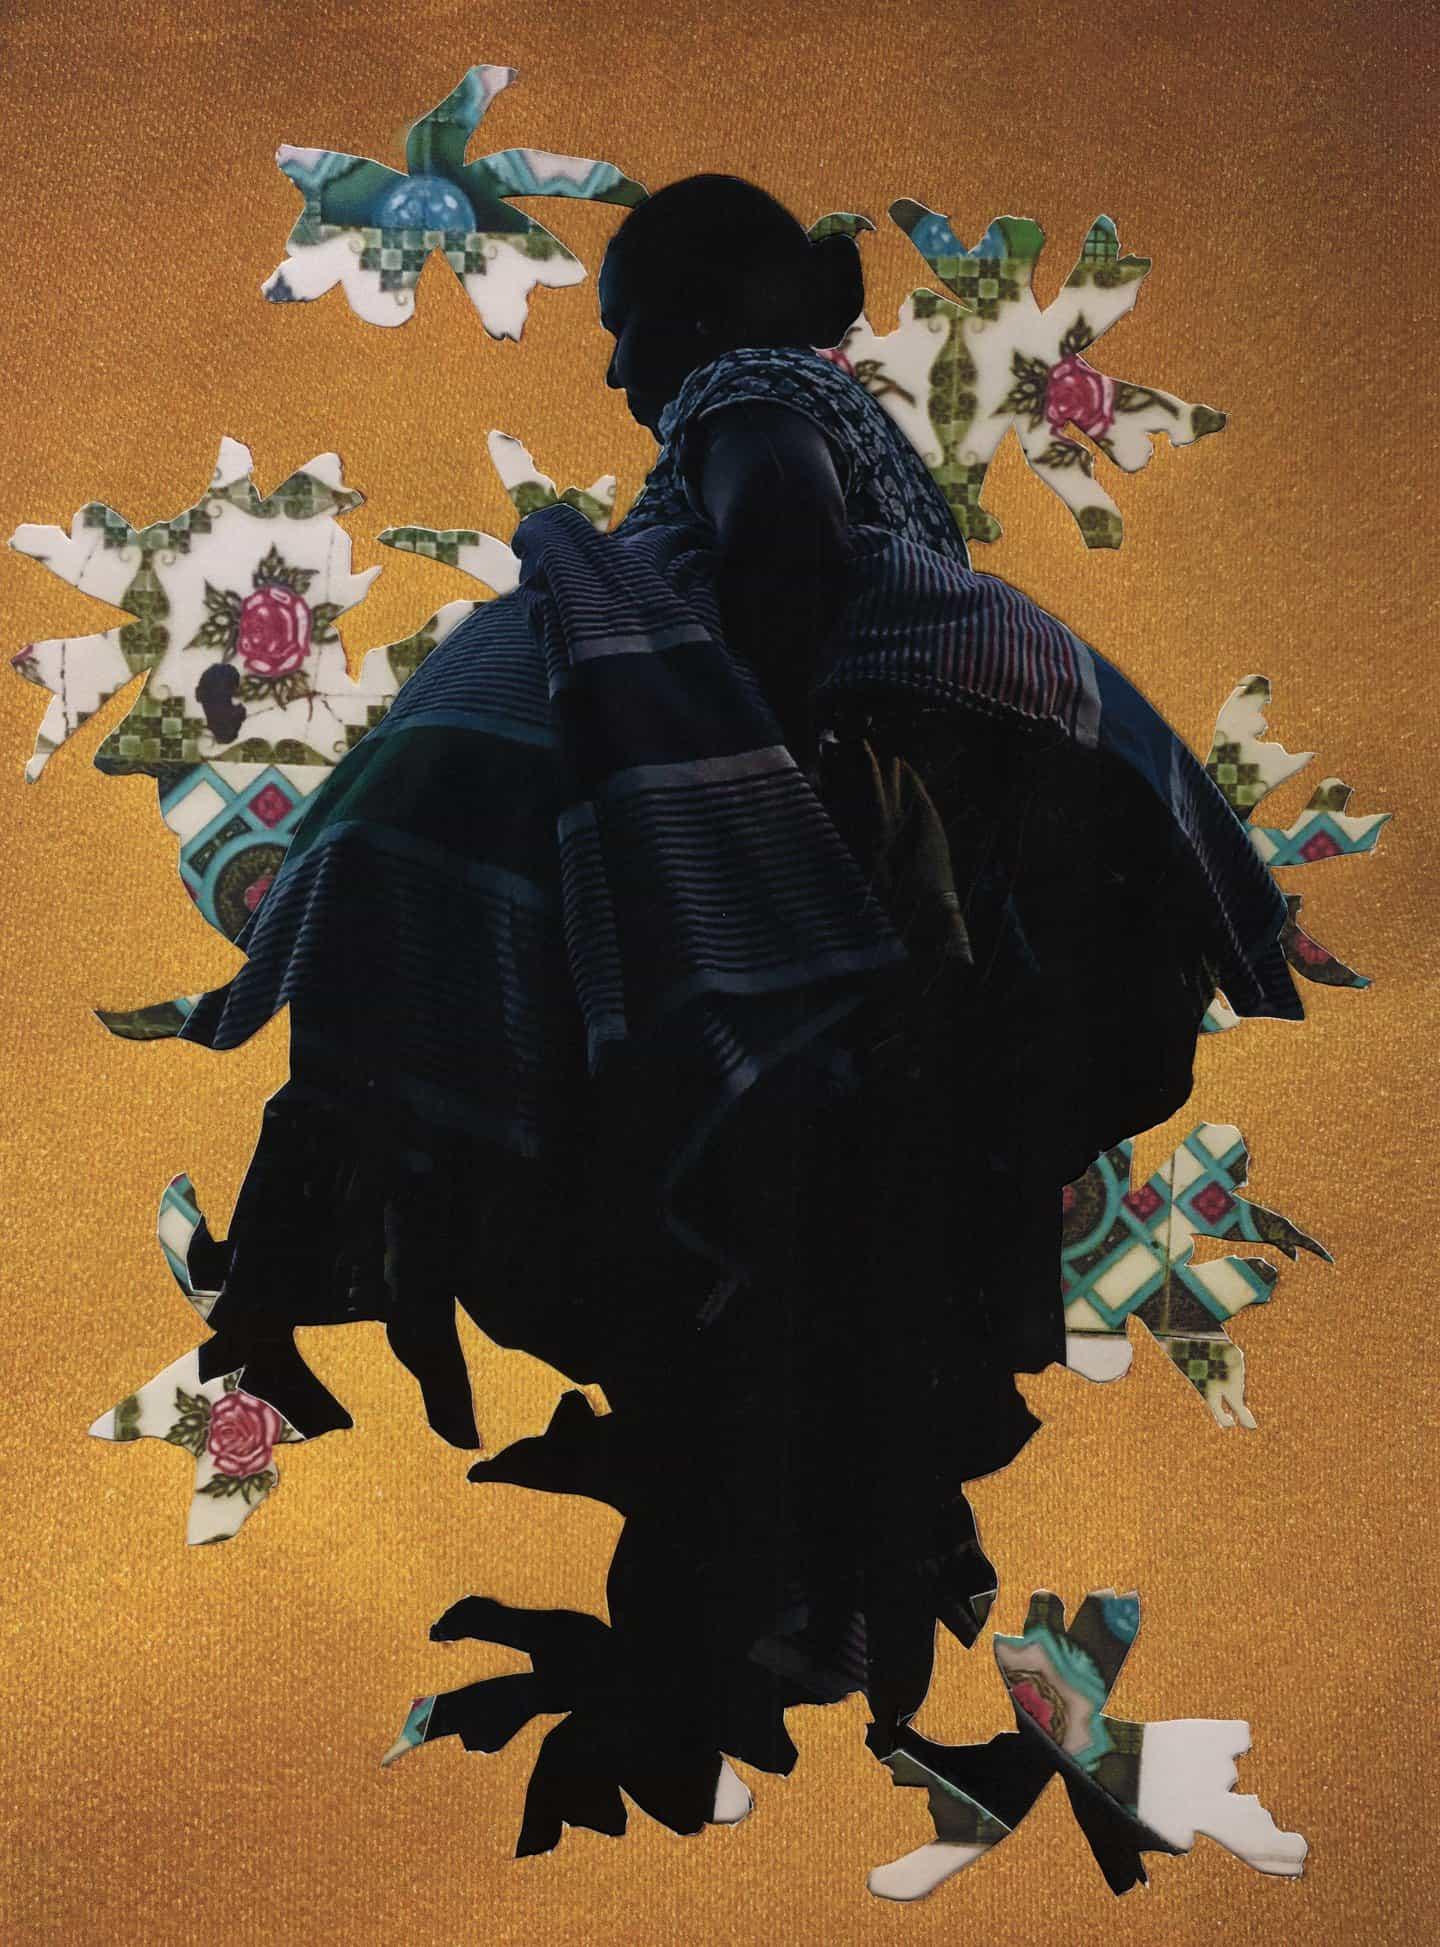 Jazz Grant: Woman Walking To Print (Copyright © Jazz Grant, 2021)